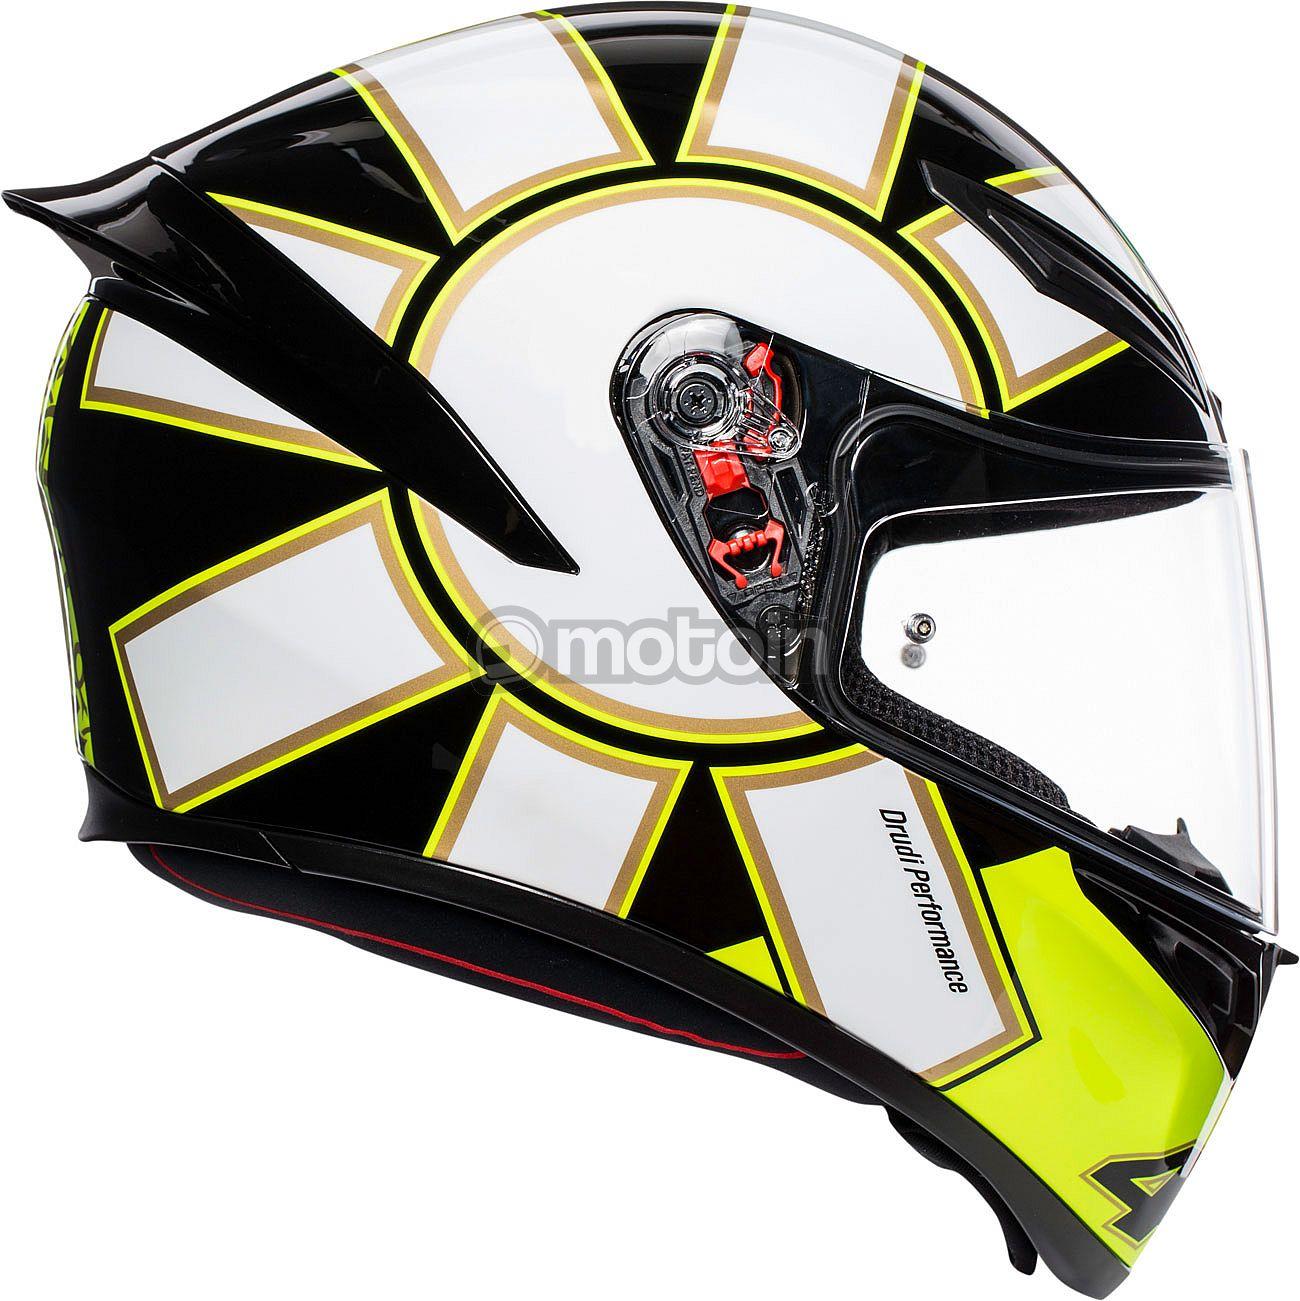 Kauftipp Sportliche Lederjacken (MOTORRAD 162015